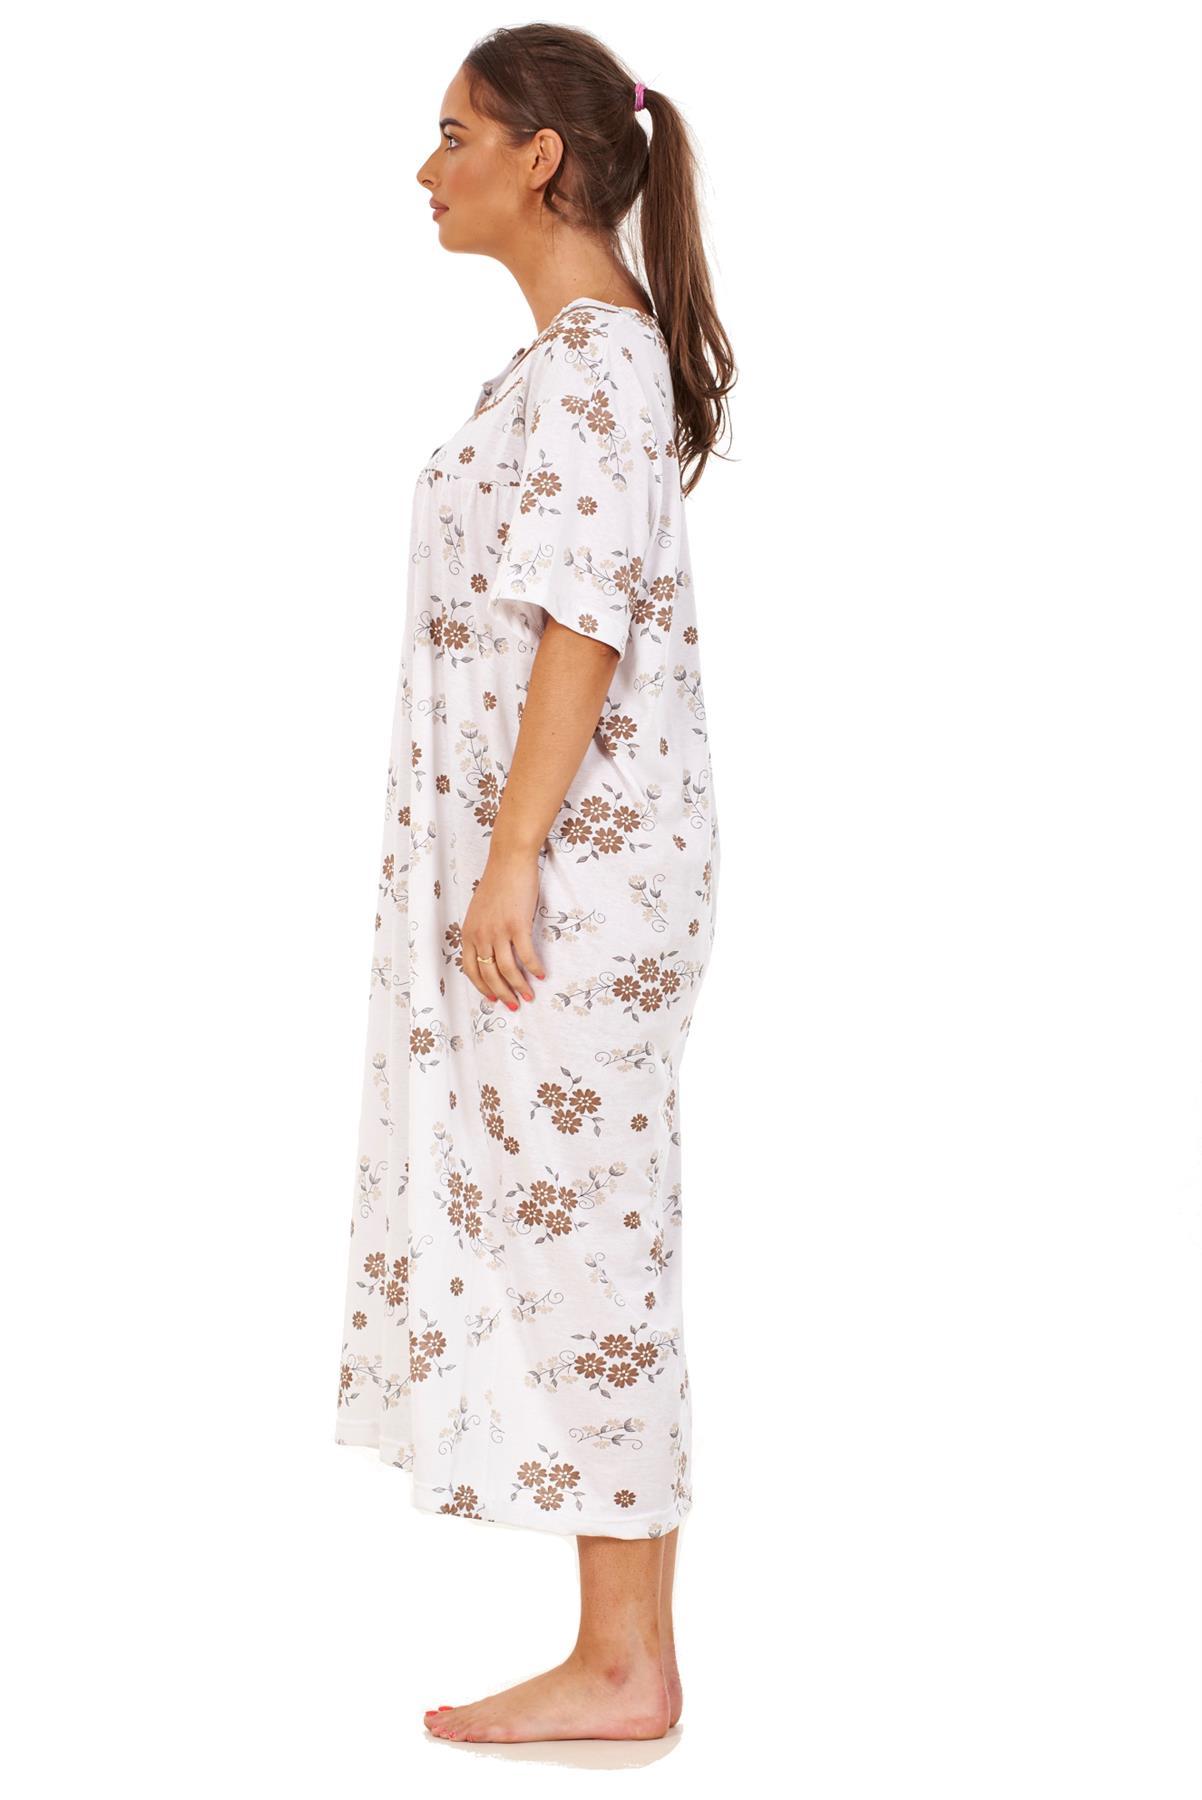 Women Long Nightdress 100/% Cotton Floral Button Short Sleeve Nightwear M to 3XL